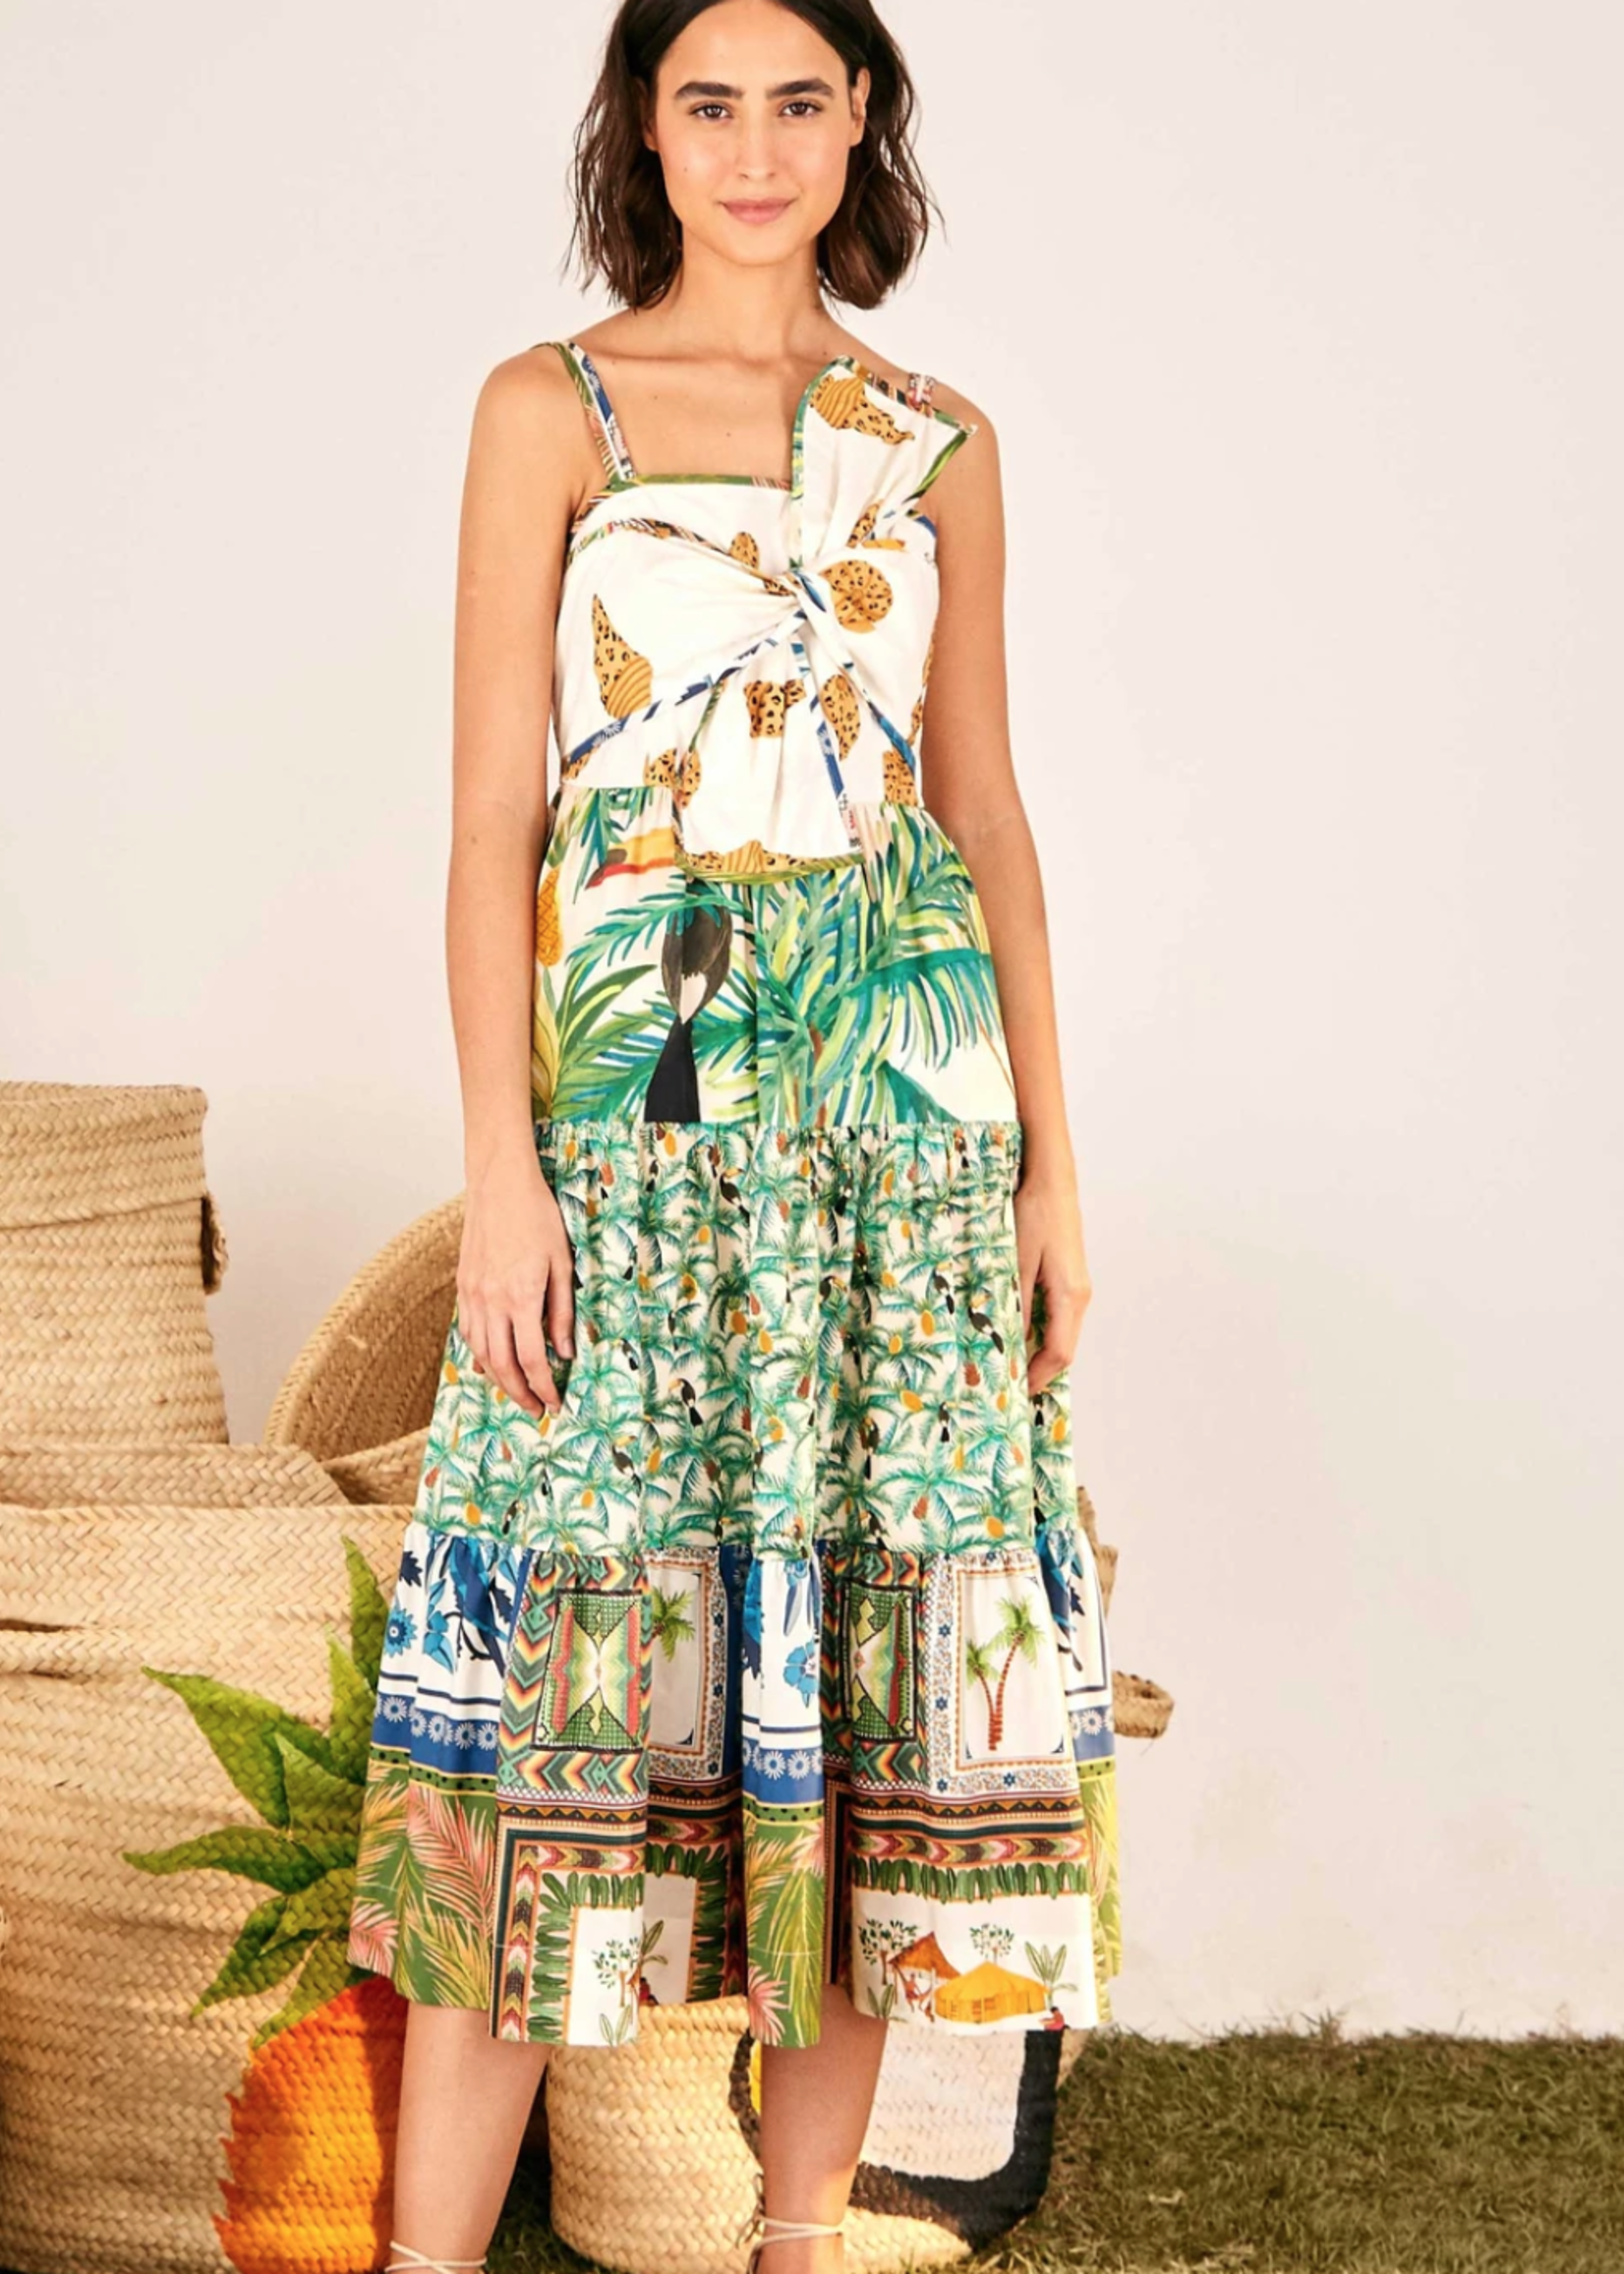 FARM RIO MIXED PRINT BOW DRESS 4/21